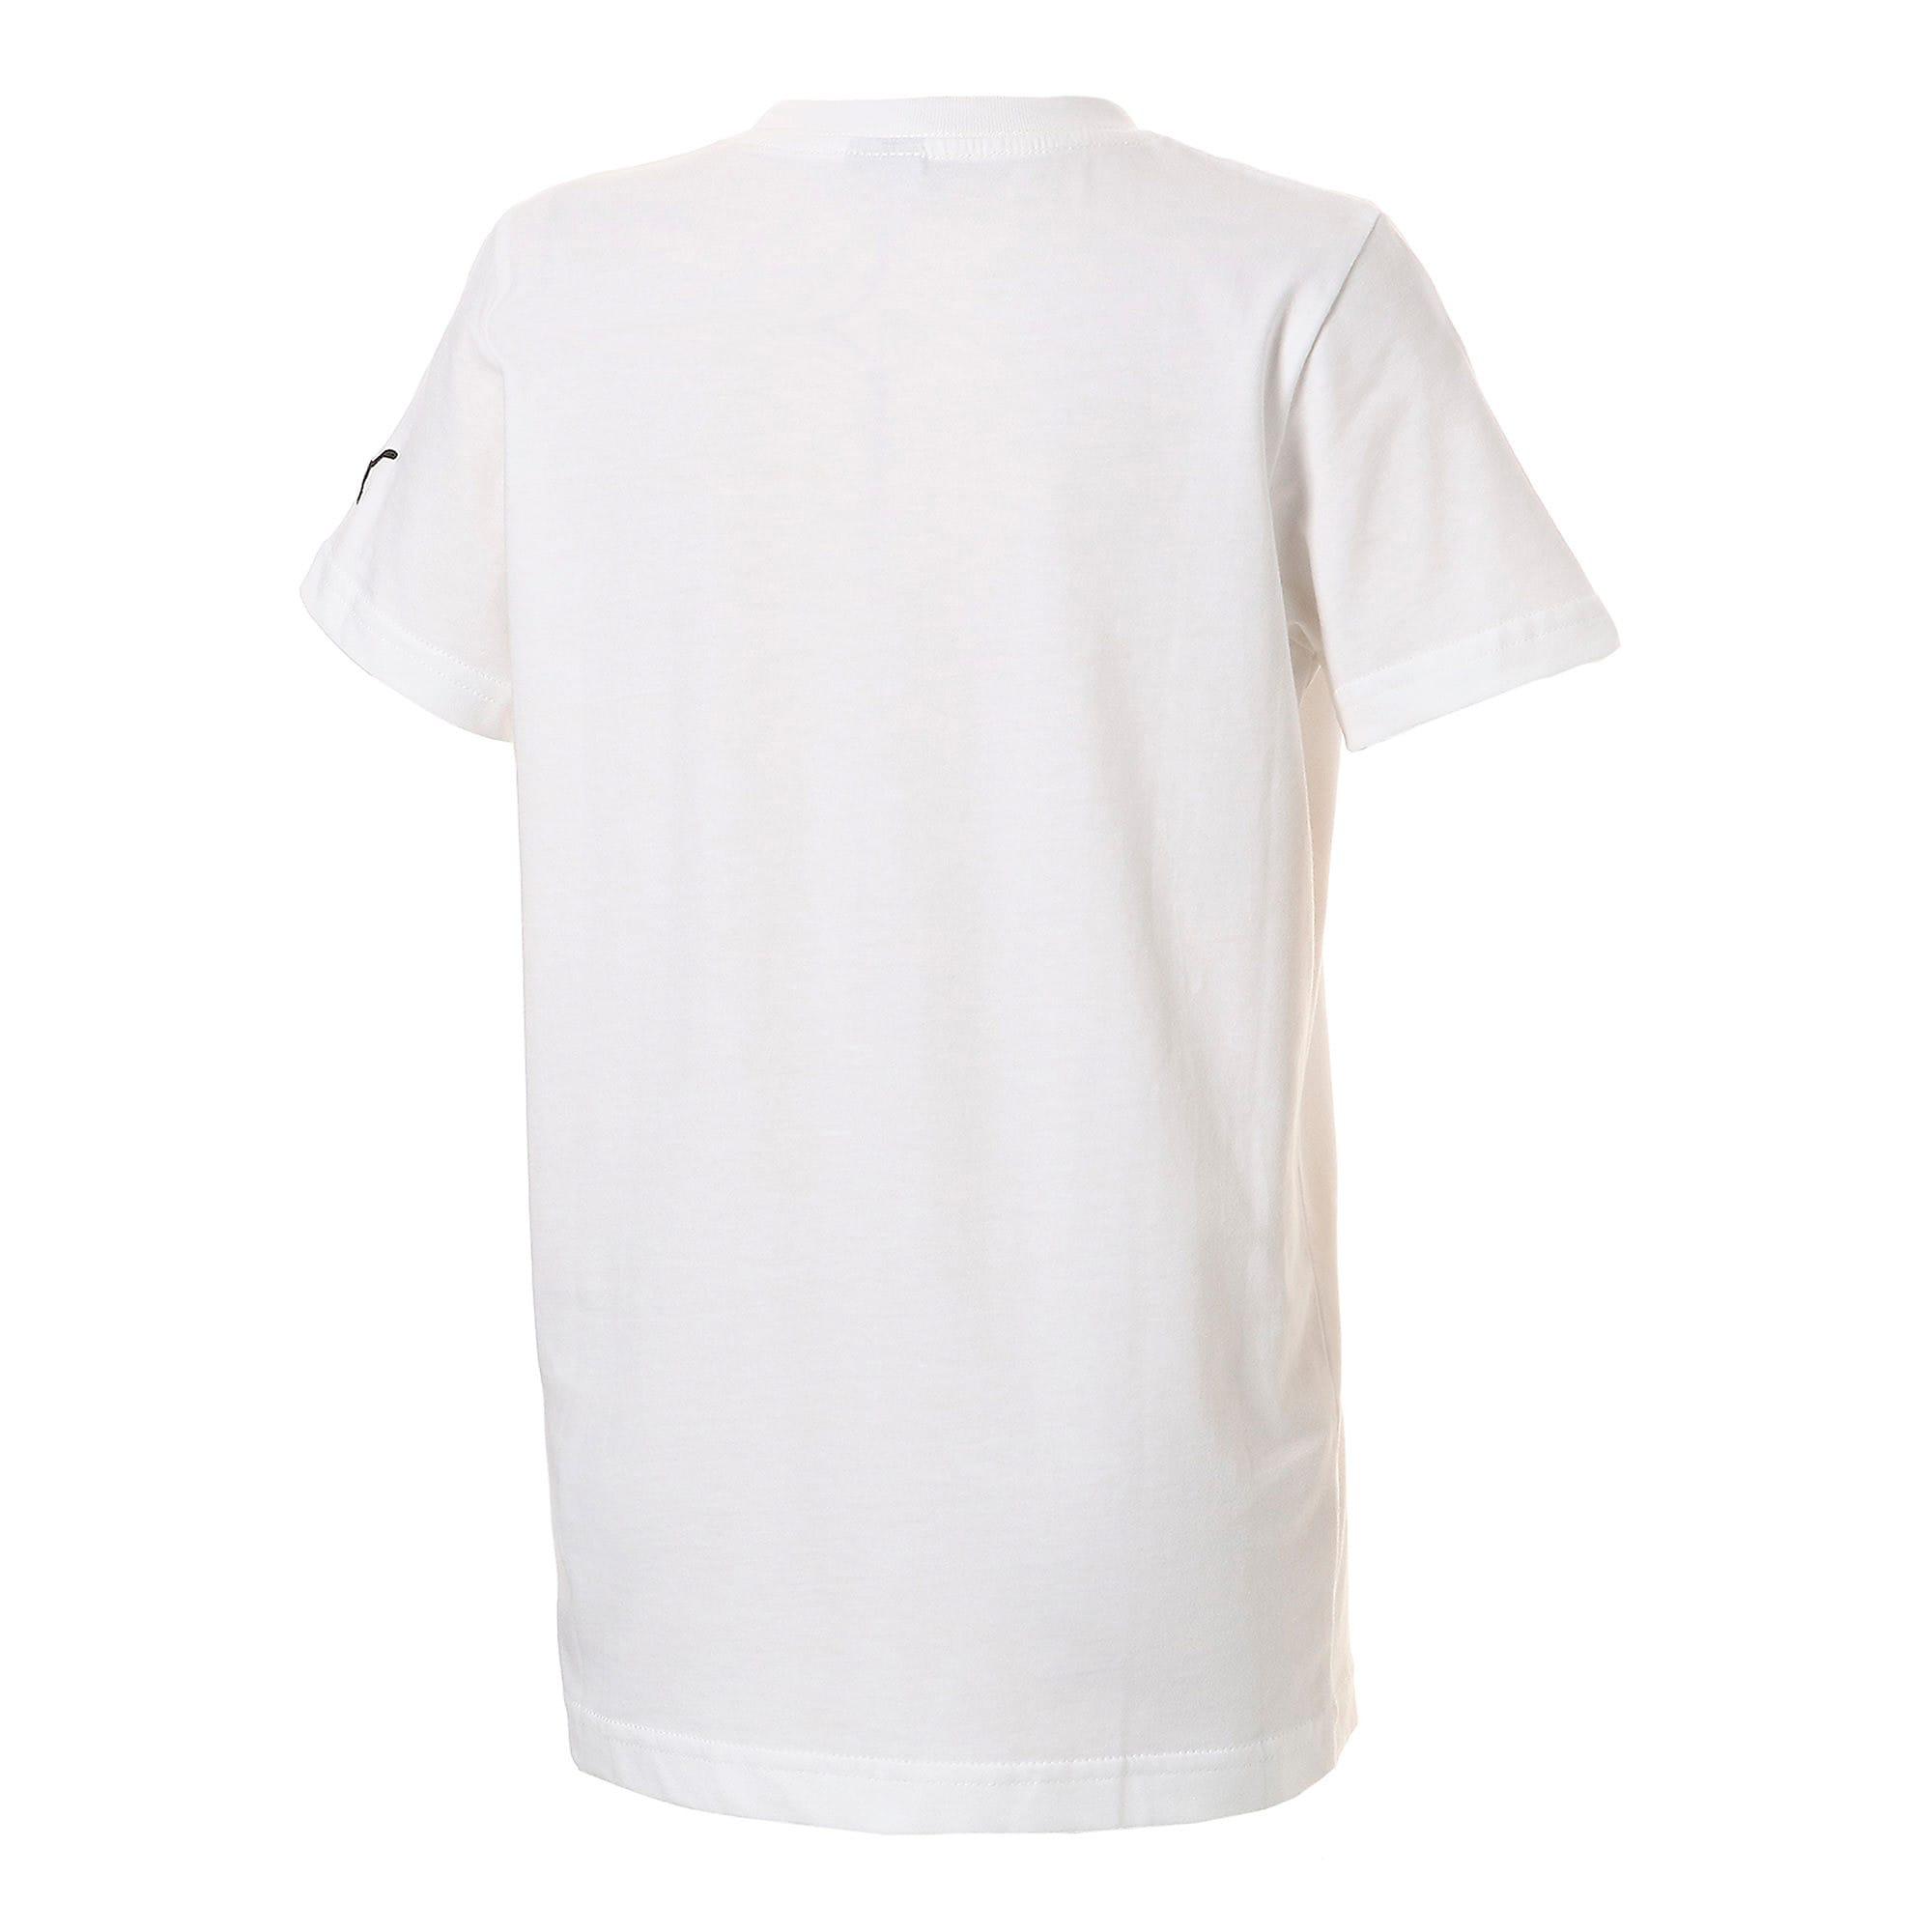 Thumbnail 3 of キッズ シティー 半袖 Tシャツ 2 OSAKA 大阪, Puma White, medium-JPN